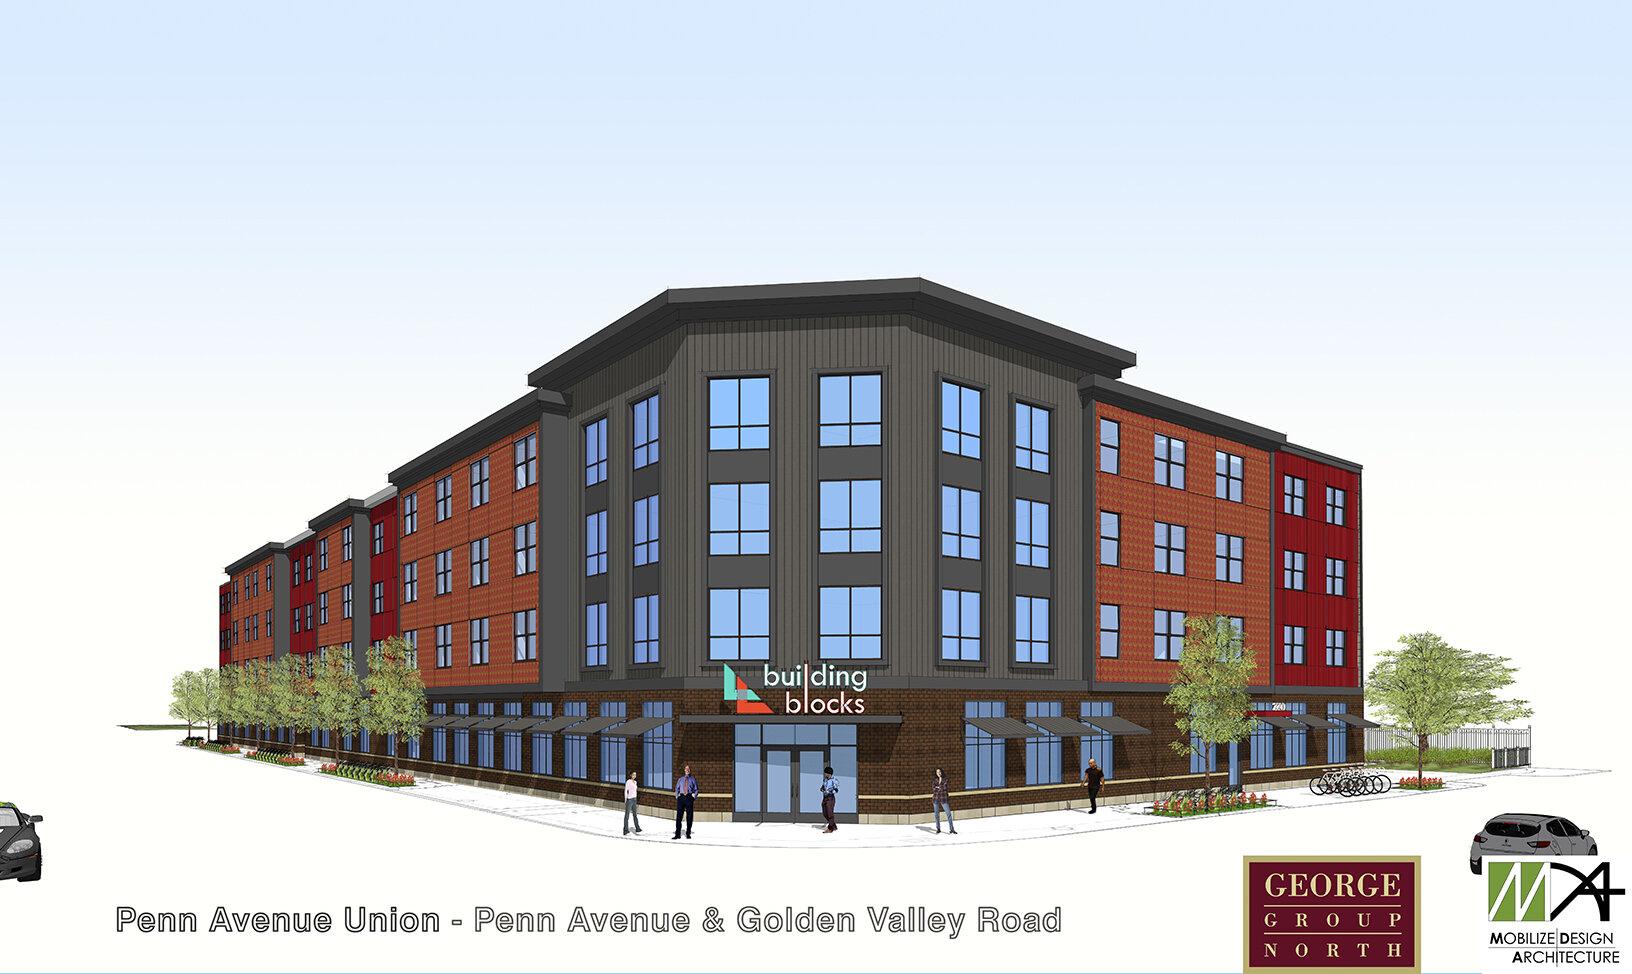 Penn_Avenue_Union_Development.jpg